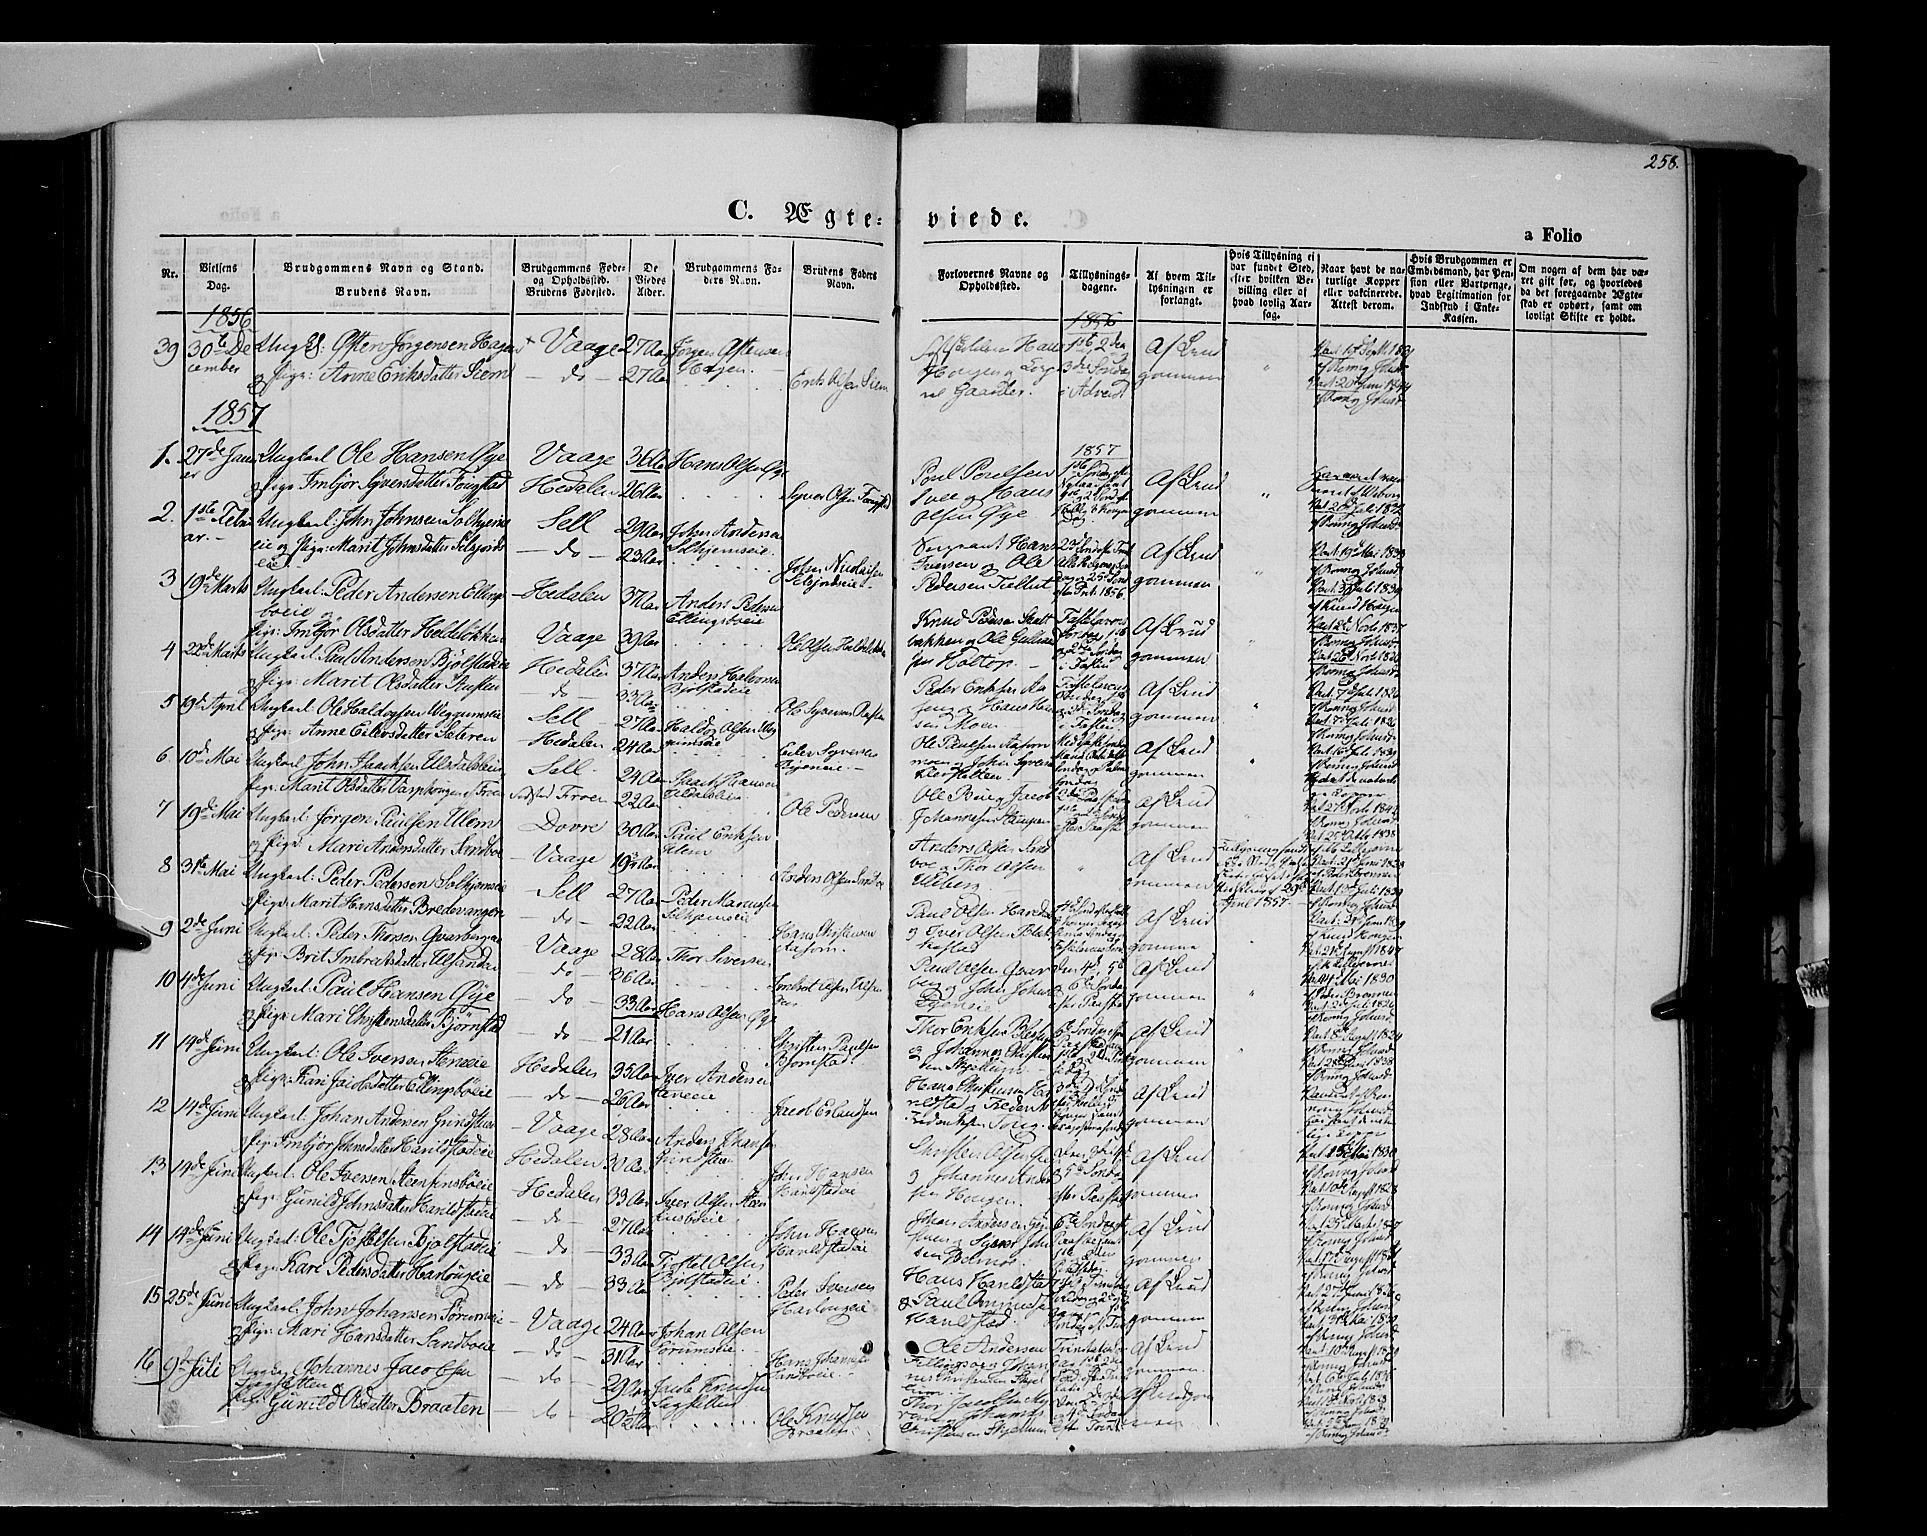 SAH, Vågå prestekontor, Ministerialbok nr. 6 /1, 1856-1872, s. 258